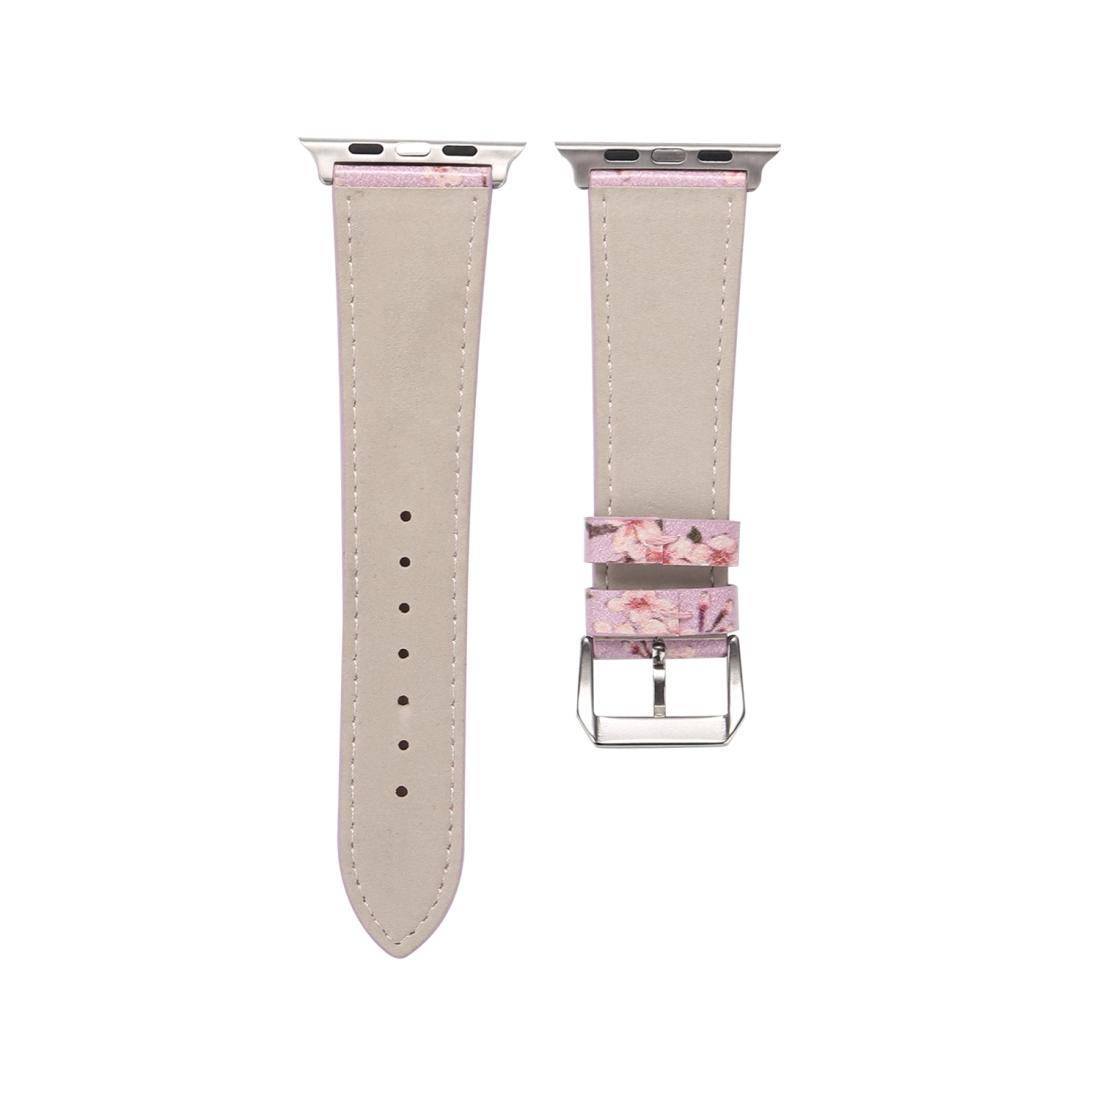 Fashion Plum Blossom Pattern Genuine Leather Wrist Watch Band for Apple Watch Series 3 & 2 & 1 42mm (Purple)